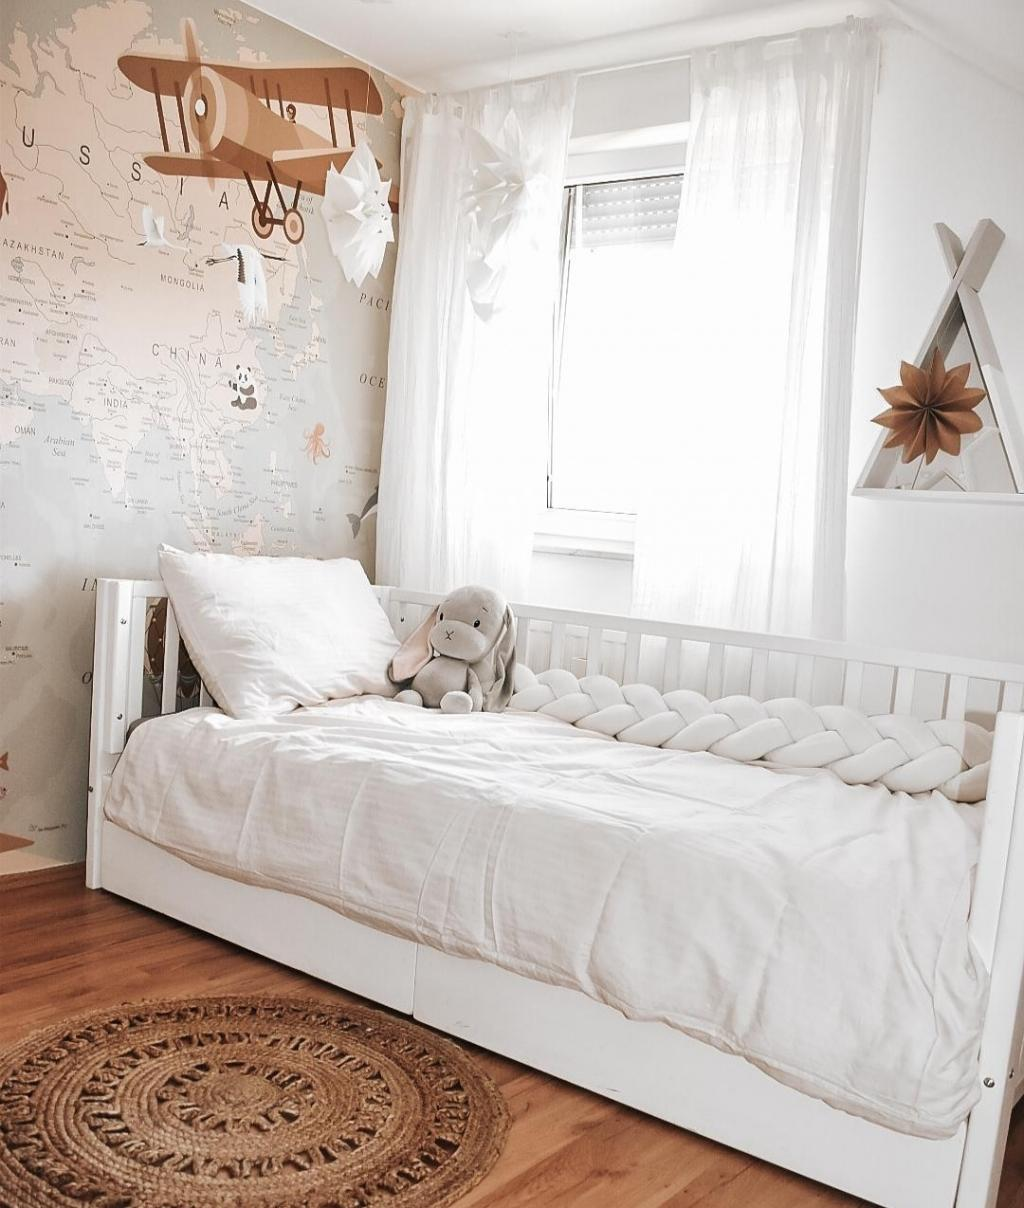 Nizka masivna postelja